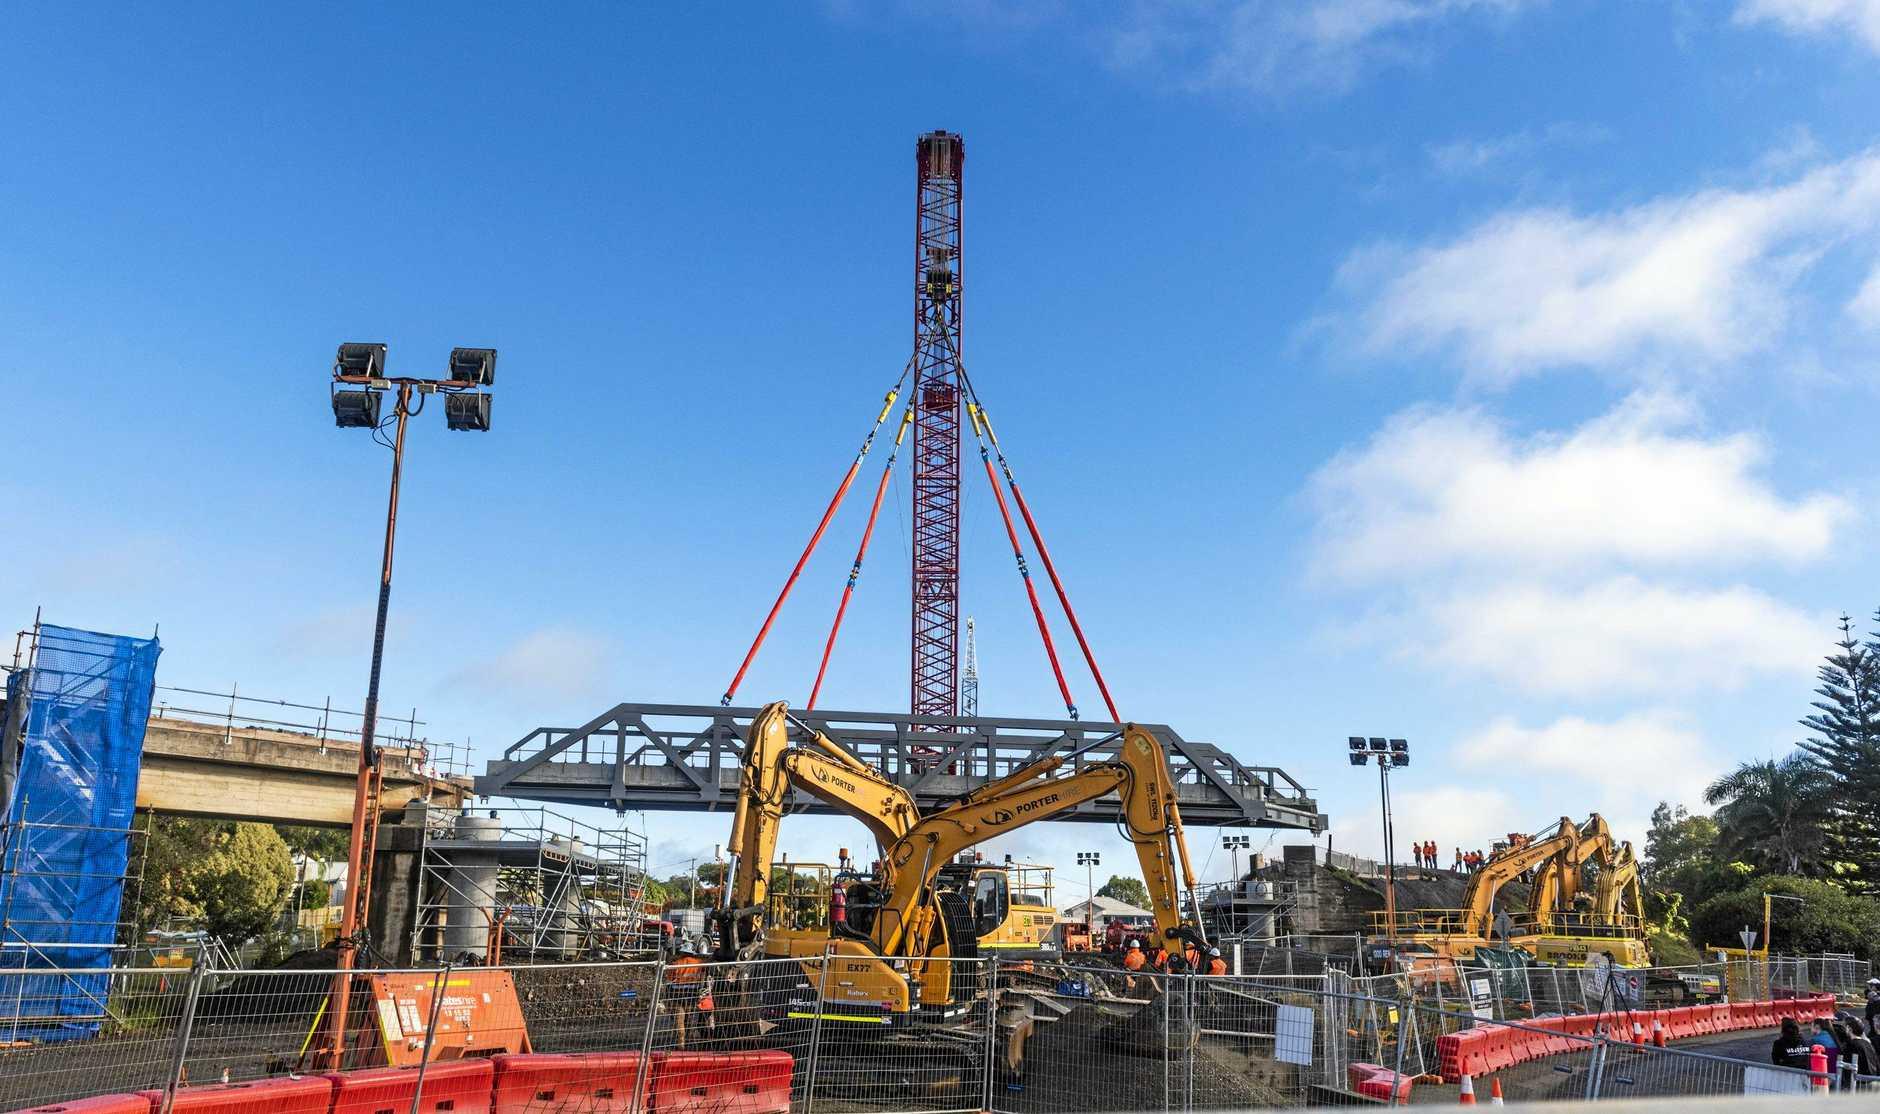 Work on replacing the rail bridge at Pound Street as part of Grafton bridge construction.